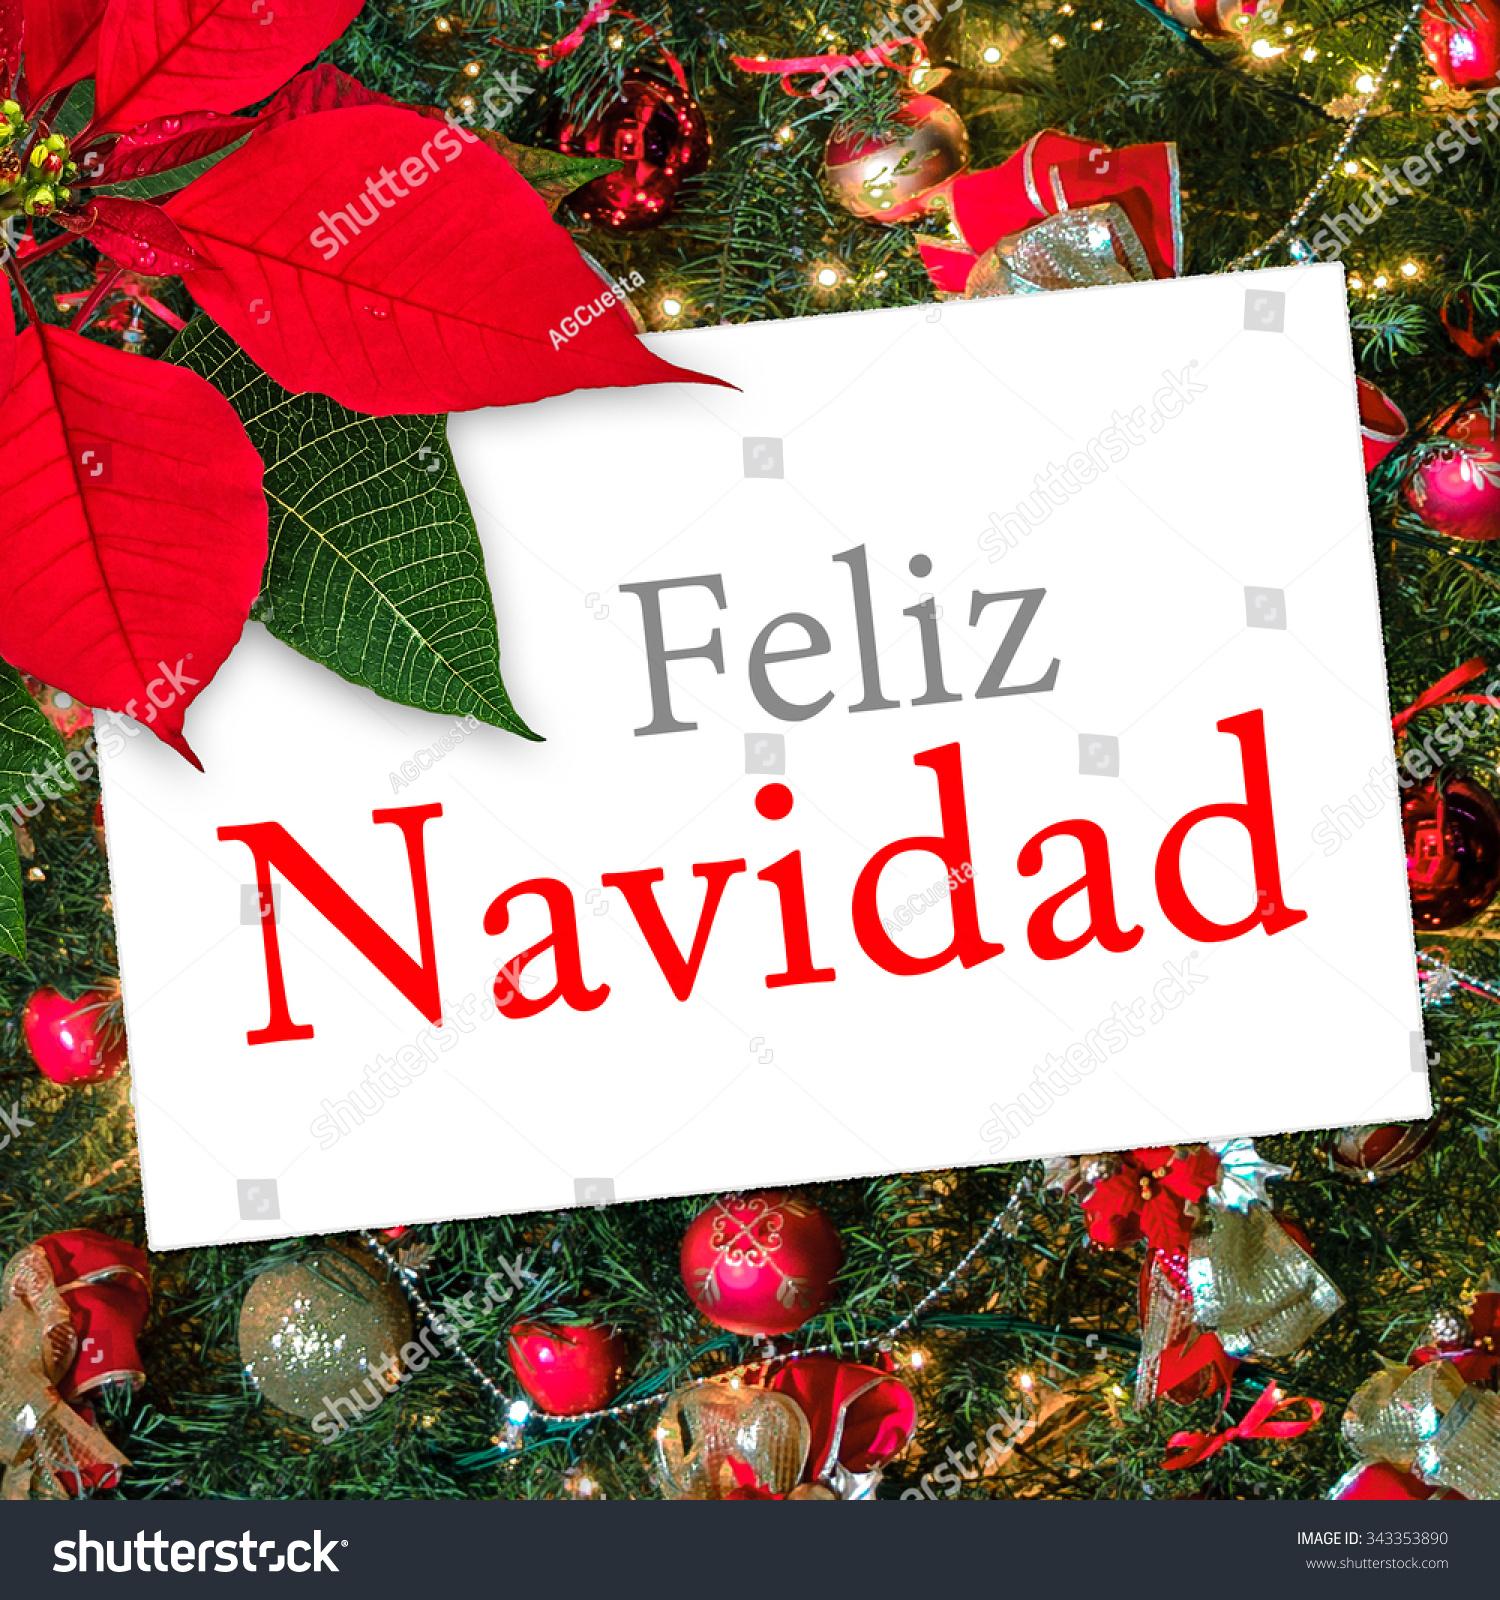 Christmas Greeting Card With Text Feliz Navidad Ribbon